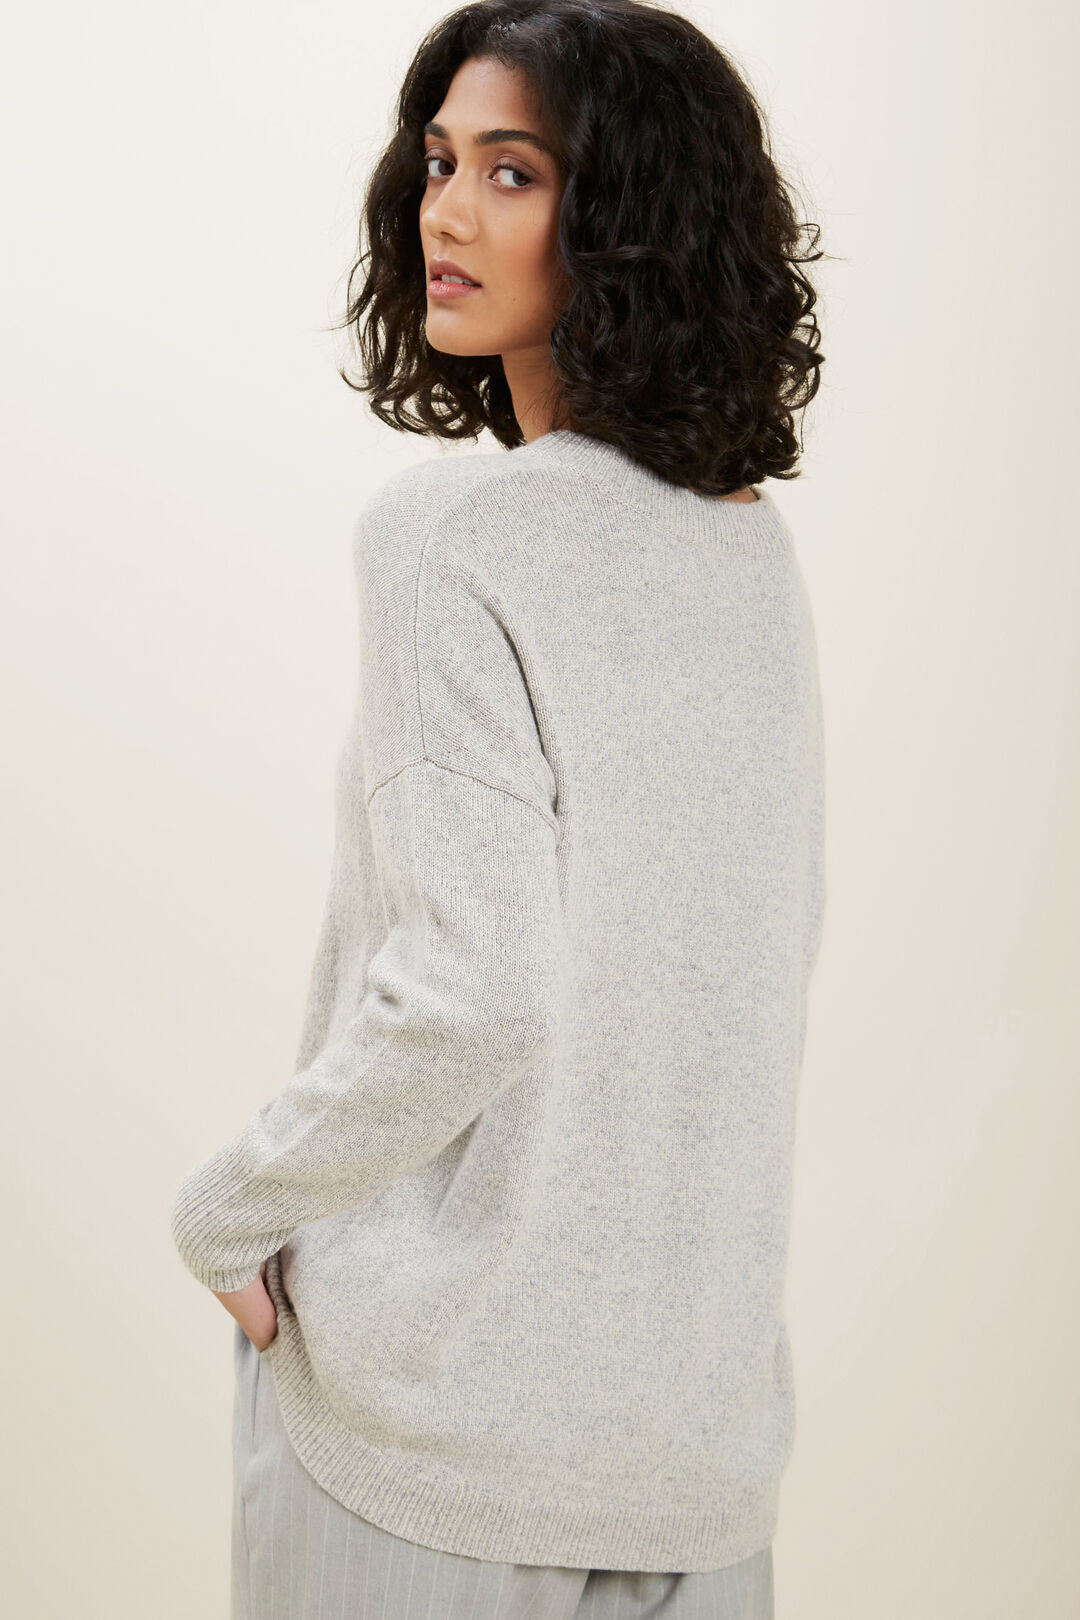 Easy  Marle  Sweater  STORMY GREY TWIST  hi-res